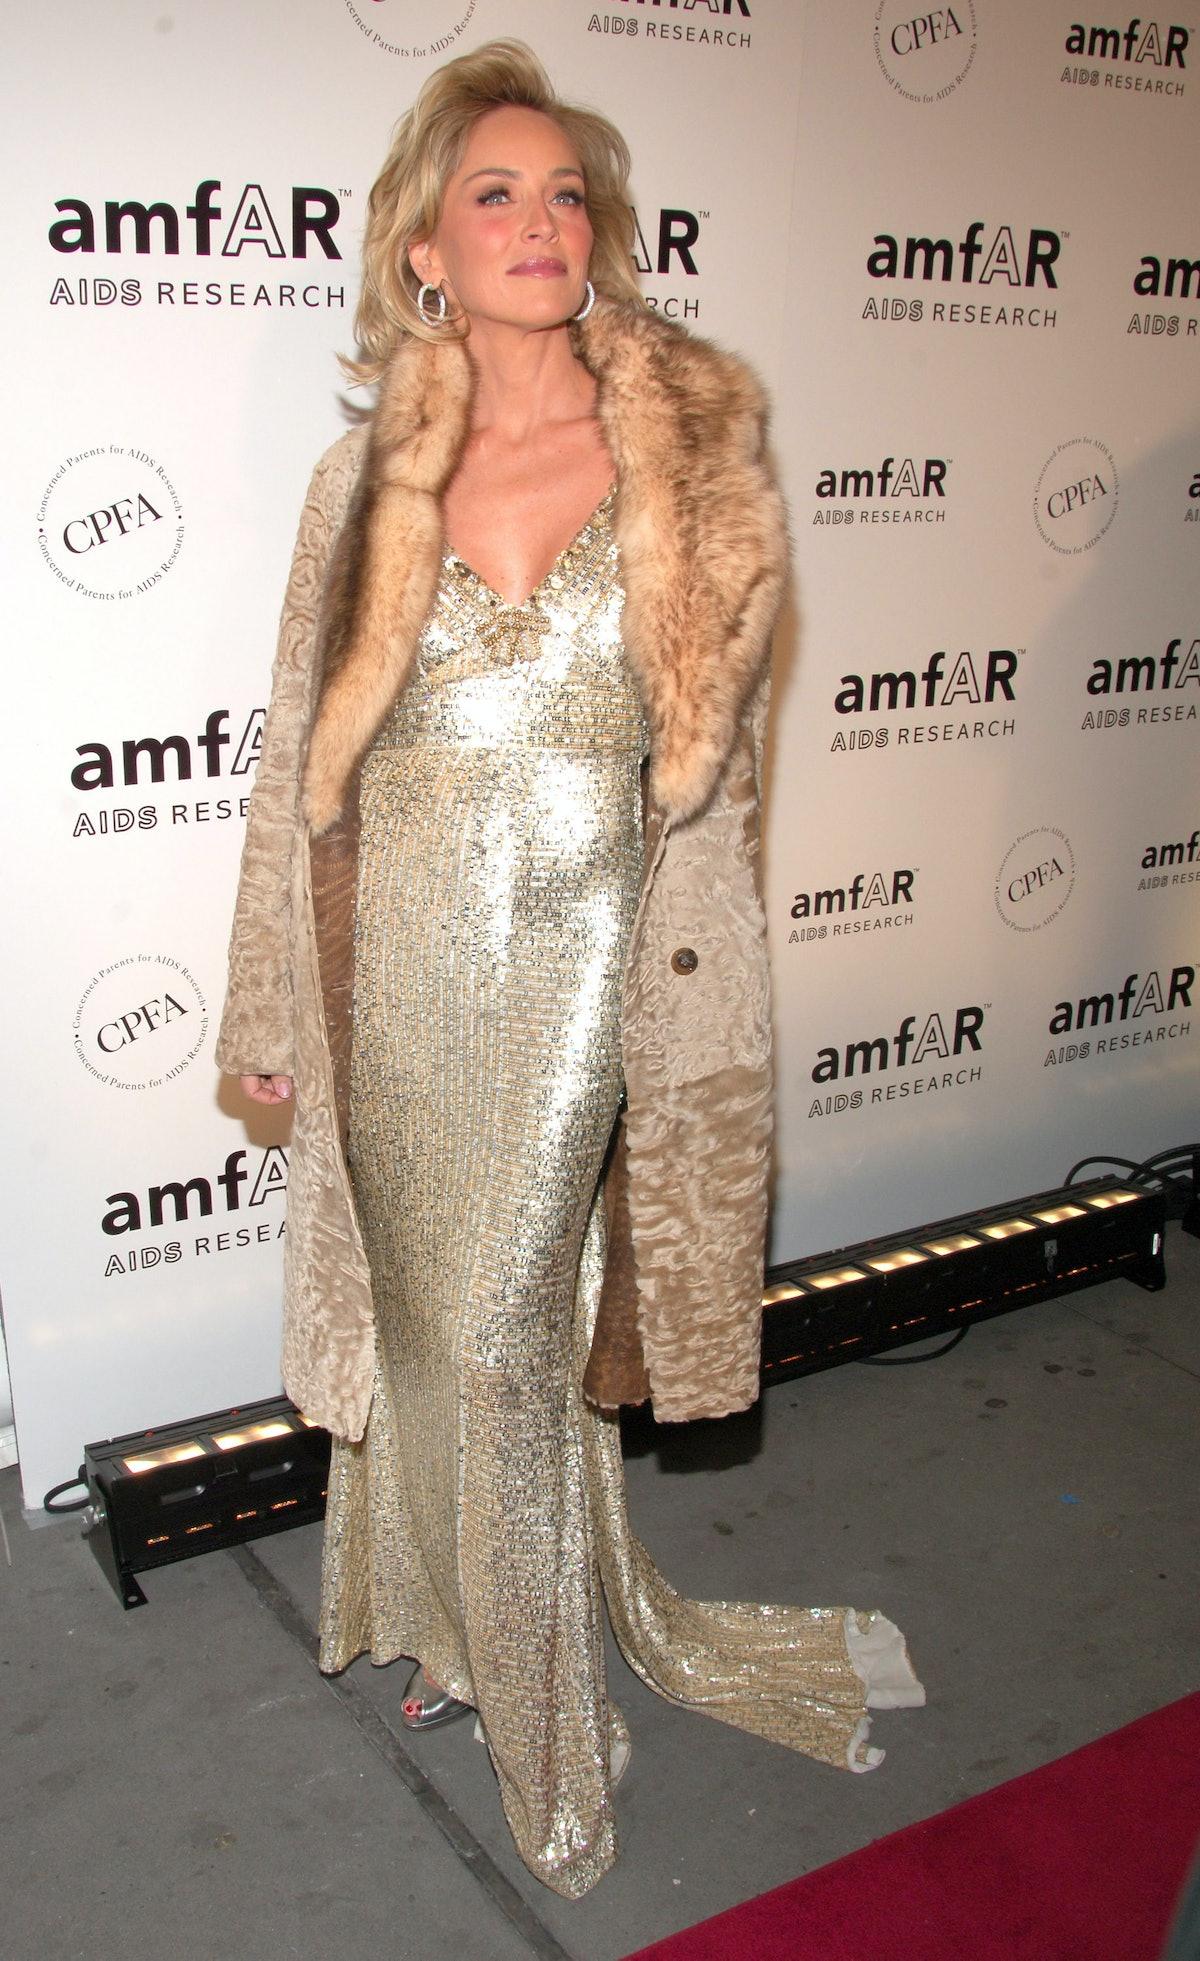 AmfAR New York City Gala Honoring John Demsey, Whoopi Goldberg and Bill Roedy - Inside